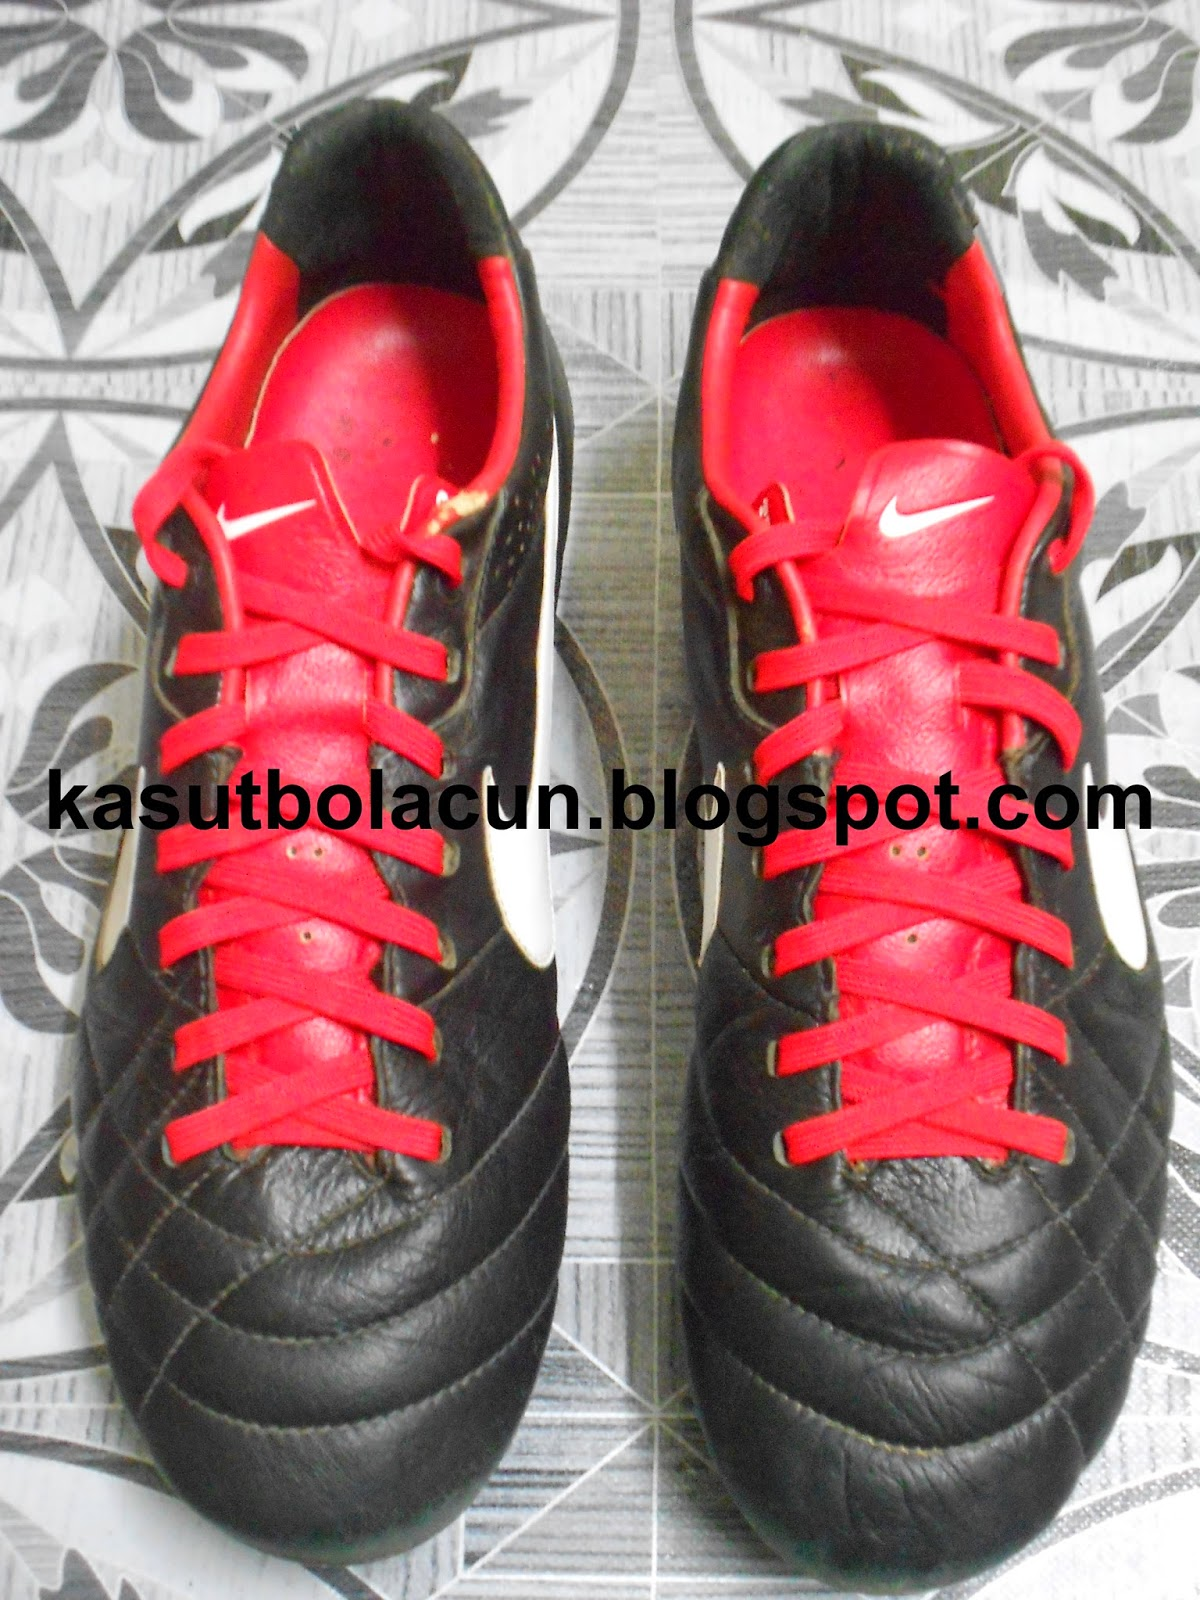 http://kasutbolacun.blogspot.com/2015/04/nike-tiempo-legend-4-sgpro_31.html